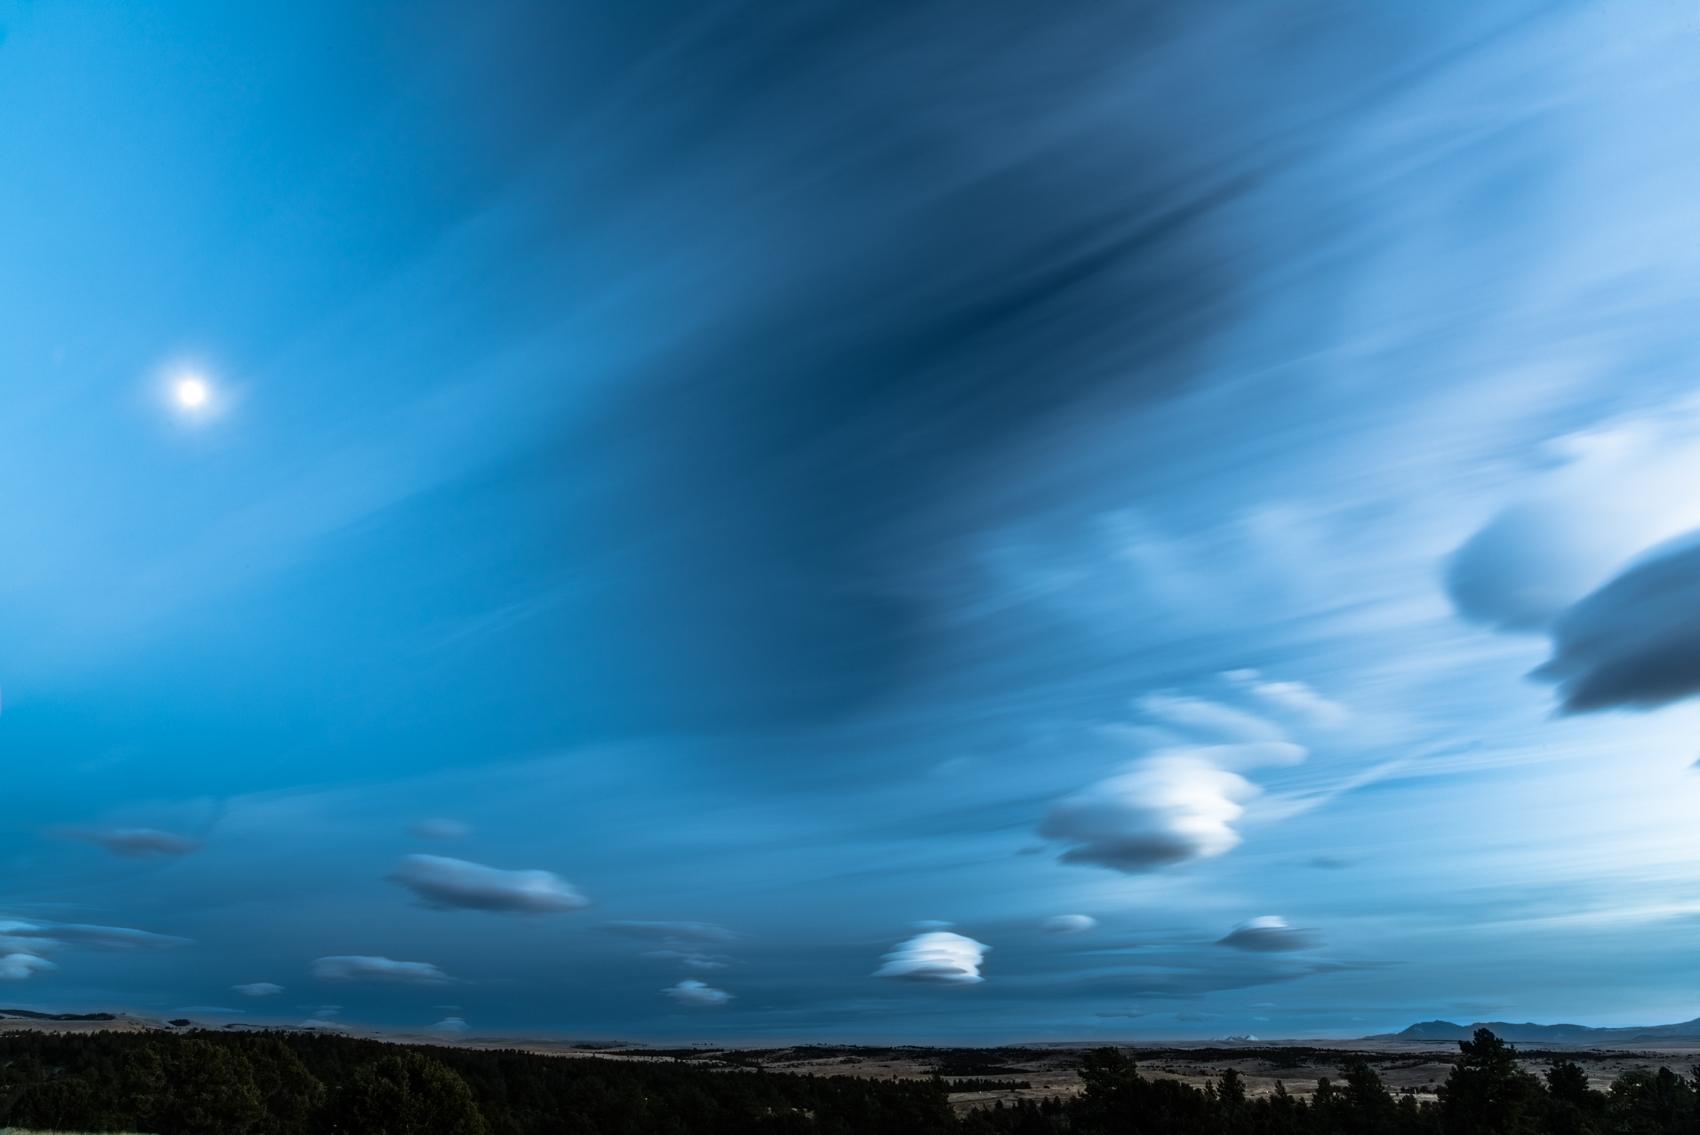 The Blue Planet I